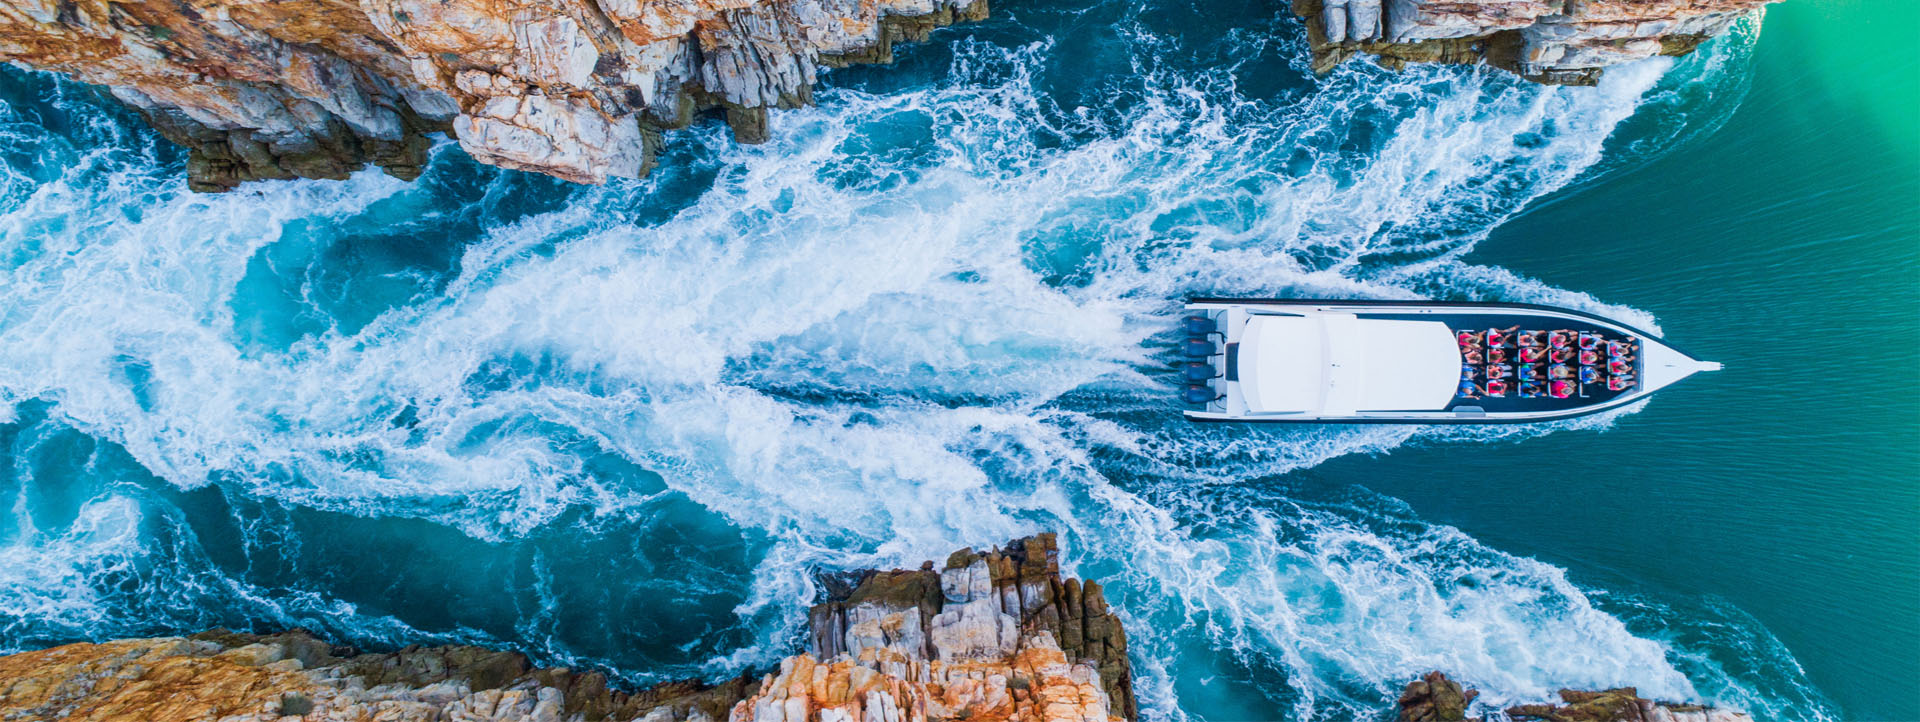 HORIZONTAL FALLS FLIGHTS boat going through gap image